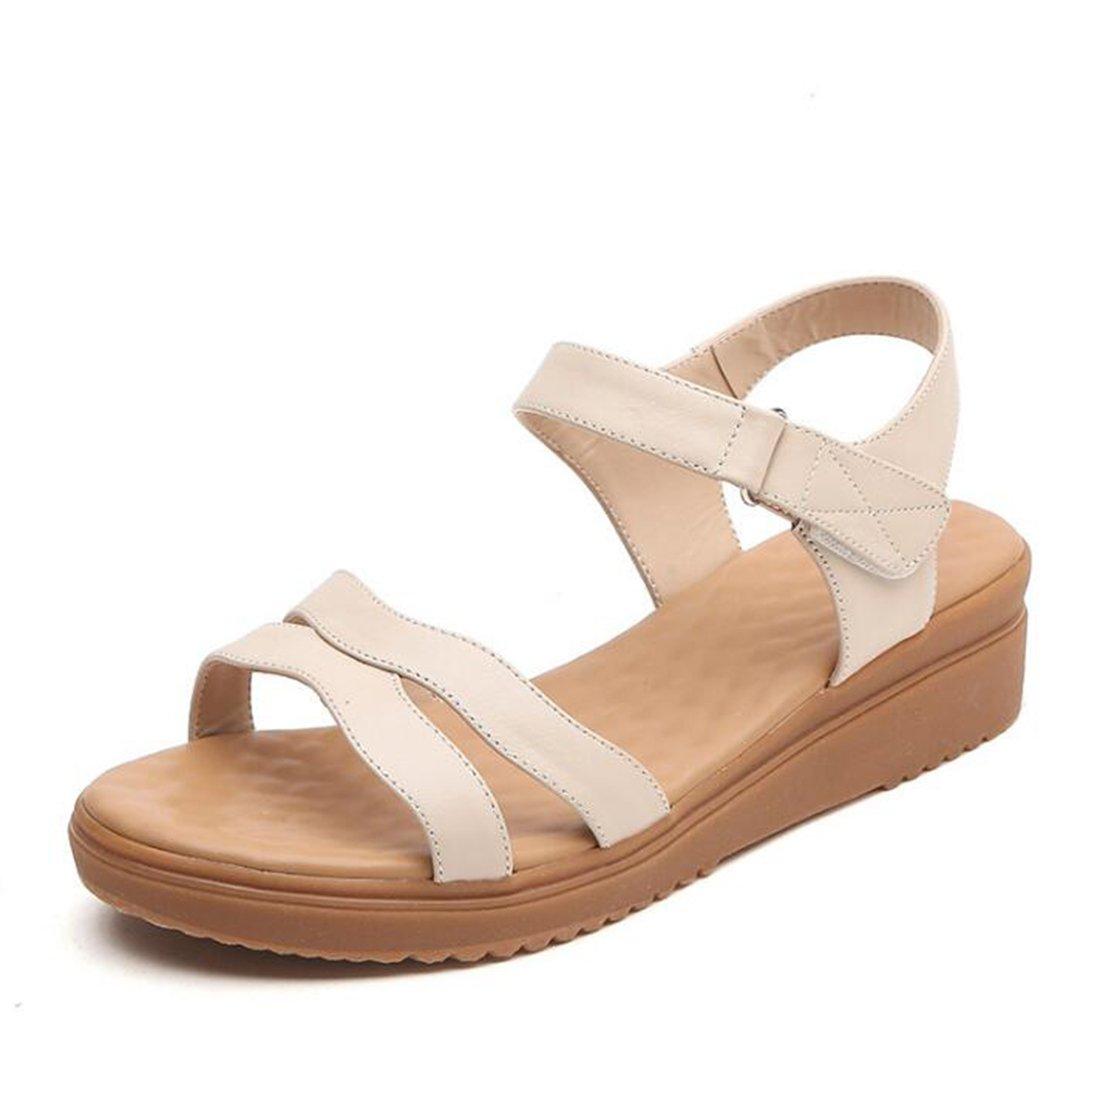 ZHONGST Frau Sommer Leder Sandalen Casual Fashion Plattform Atmungs Sandalen  38|Beige